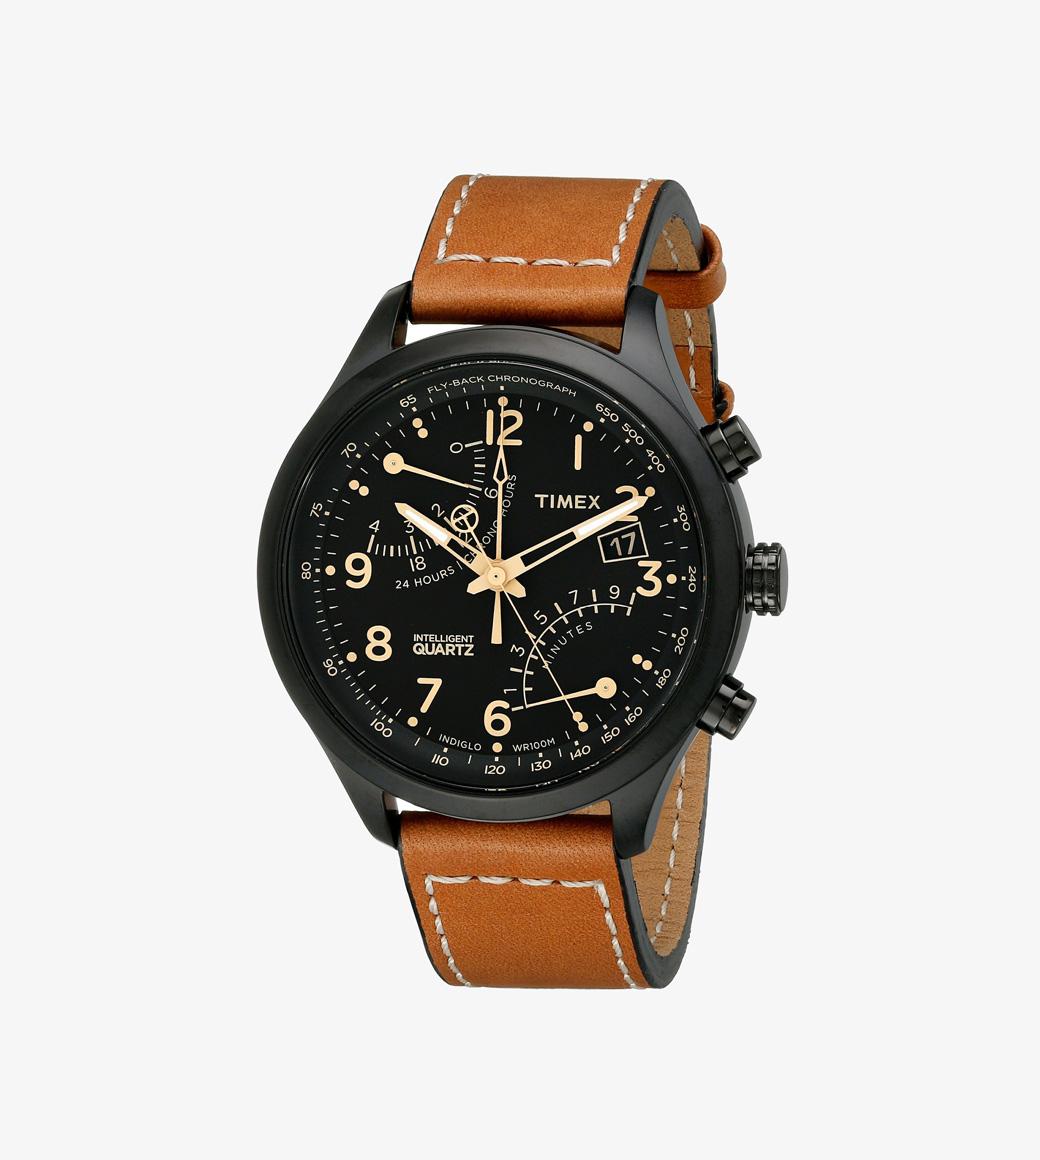 Watch Backgrounds, Compatible - PC, Mobile, Gadgets| 1040x1160 px